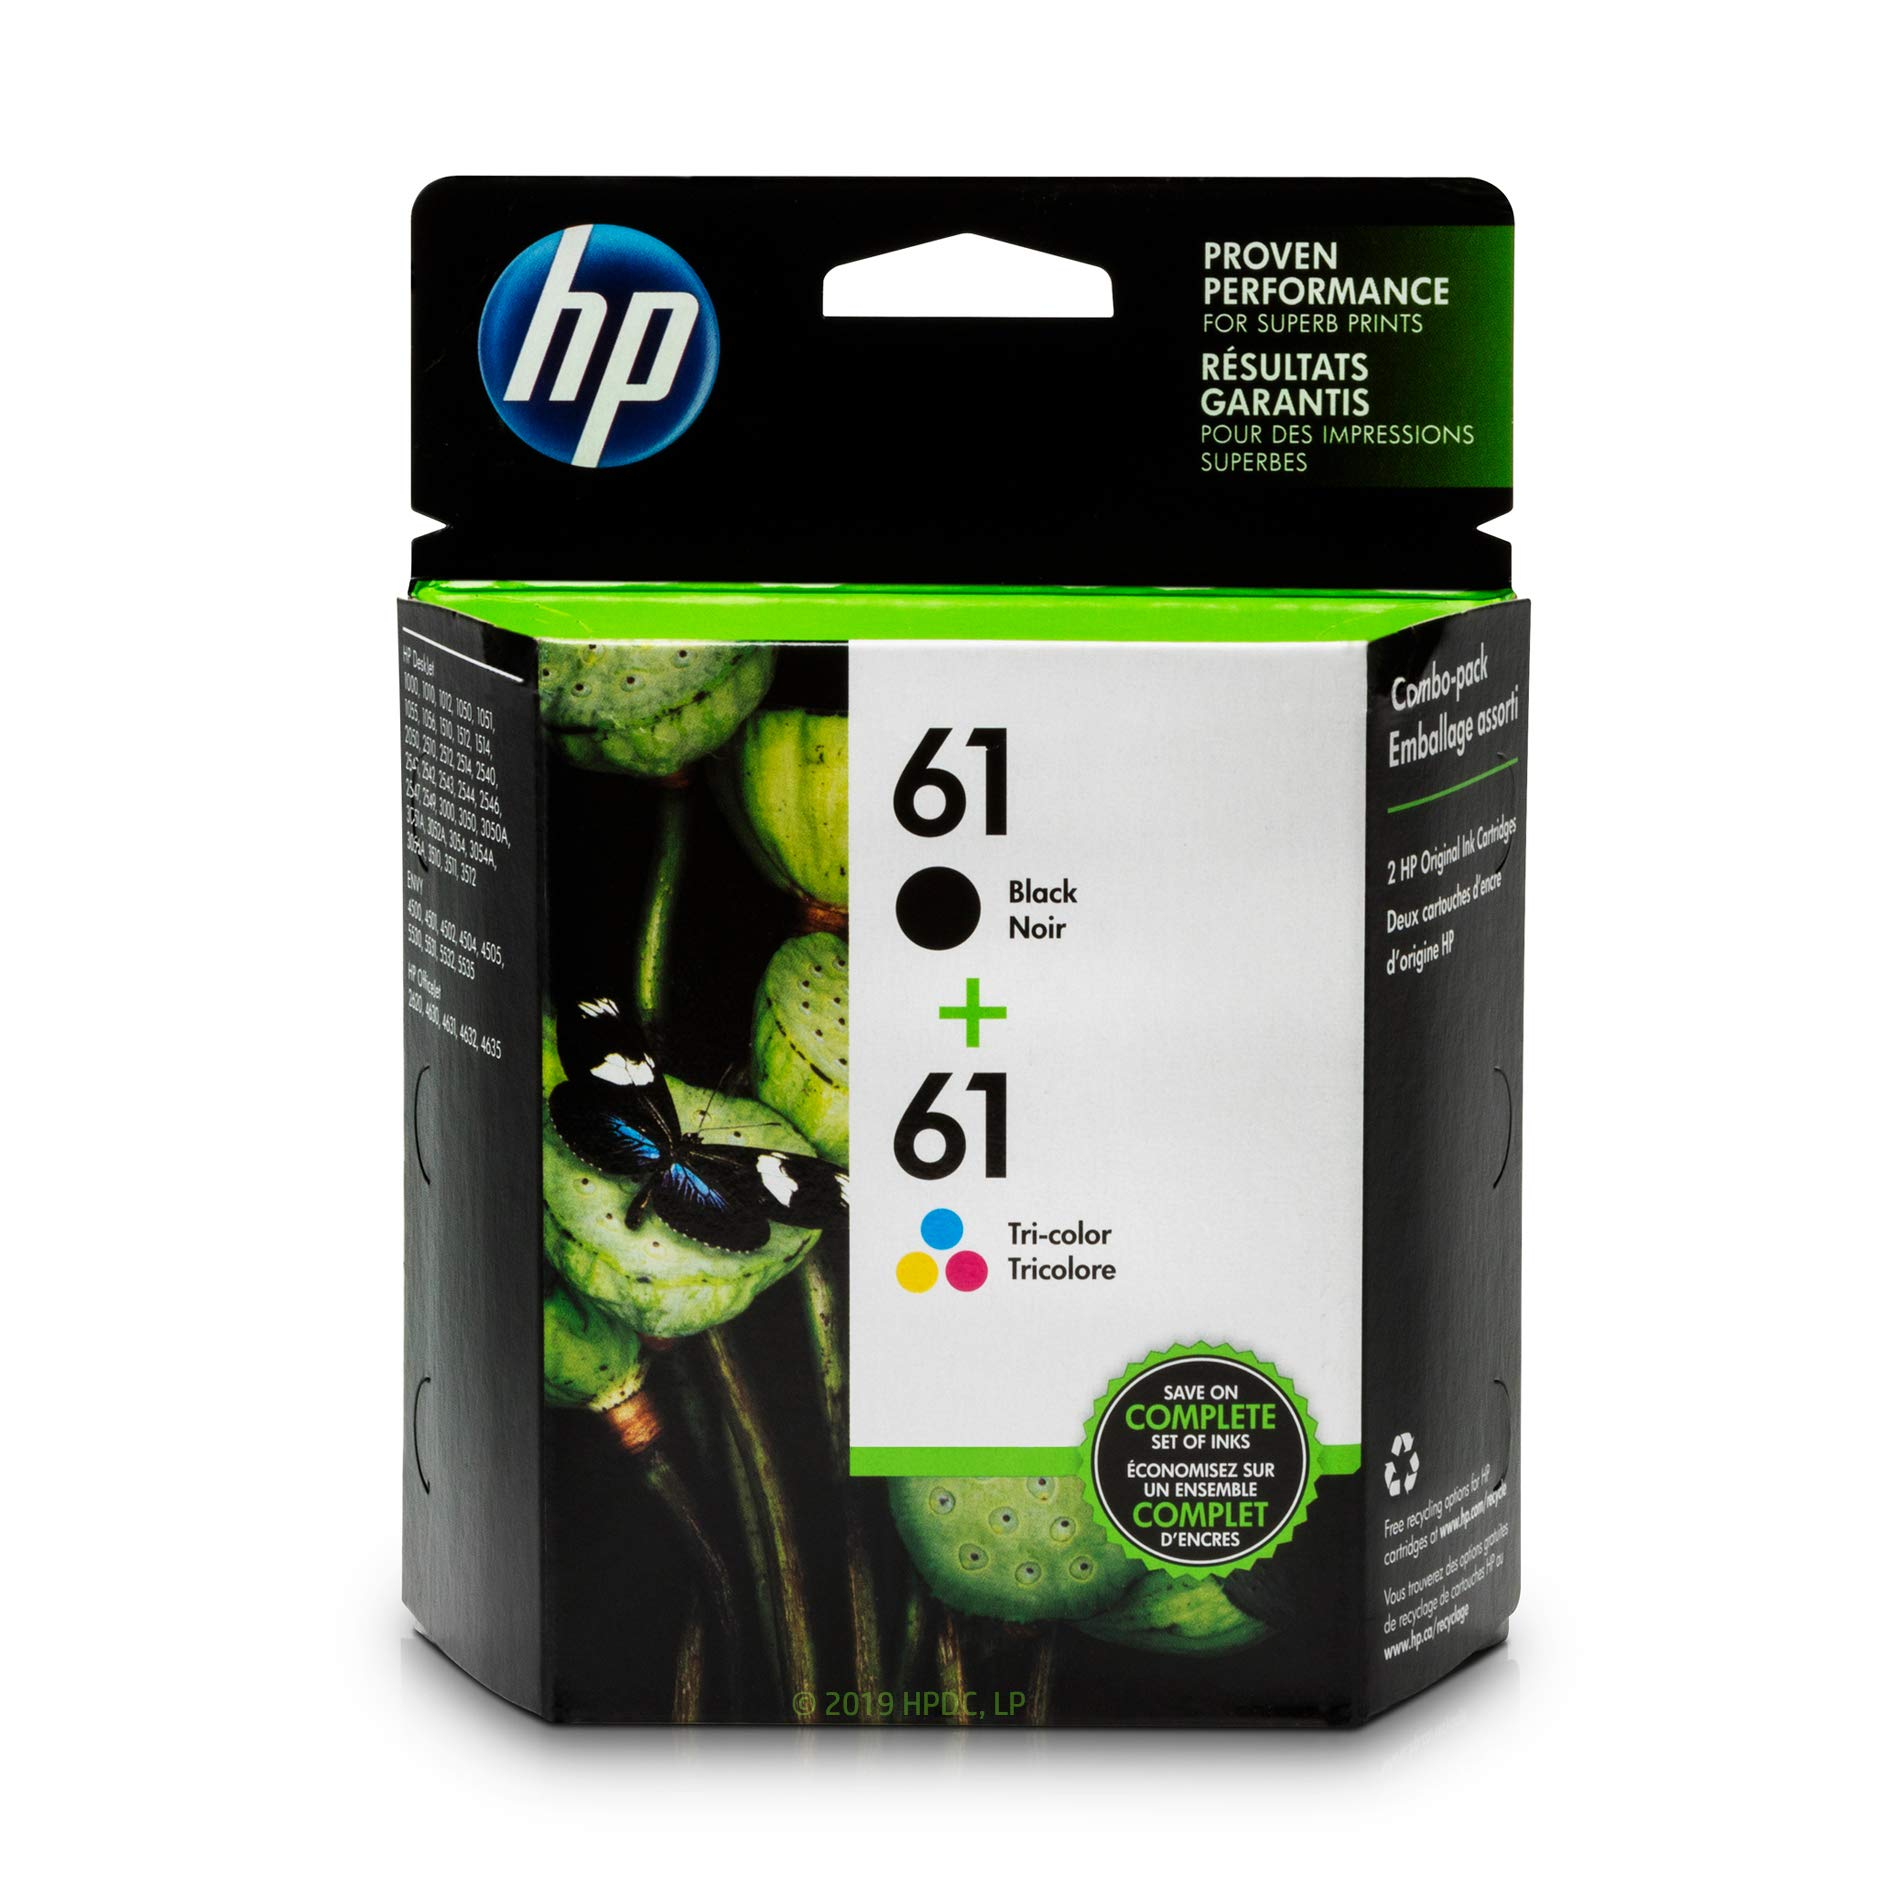 HP 61   2 Ink Cartridges   Black, Tri-color   CH561WN, CH562WN by HP